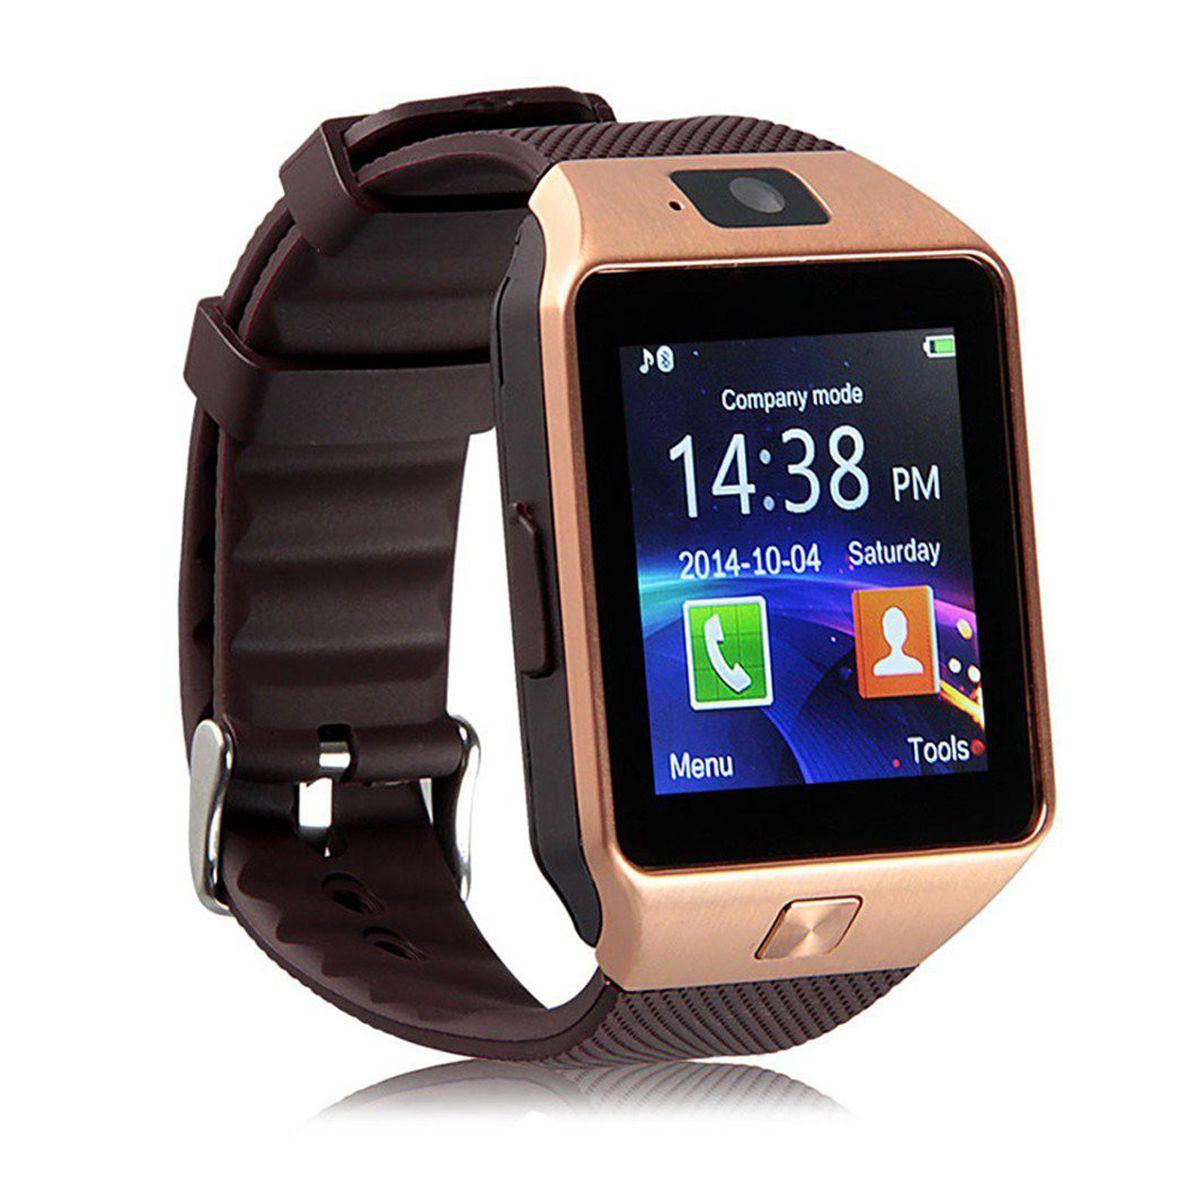 Over Tech Smartwatch Suited Karbonn Machone Titanium S310 Smart Watches